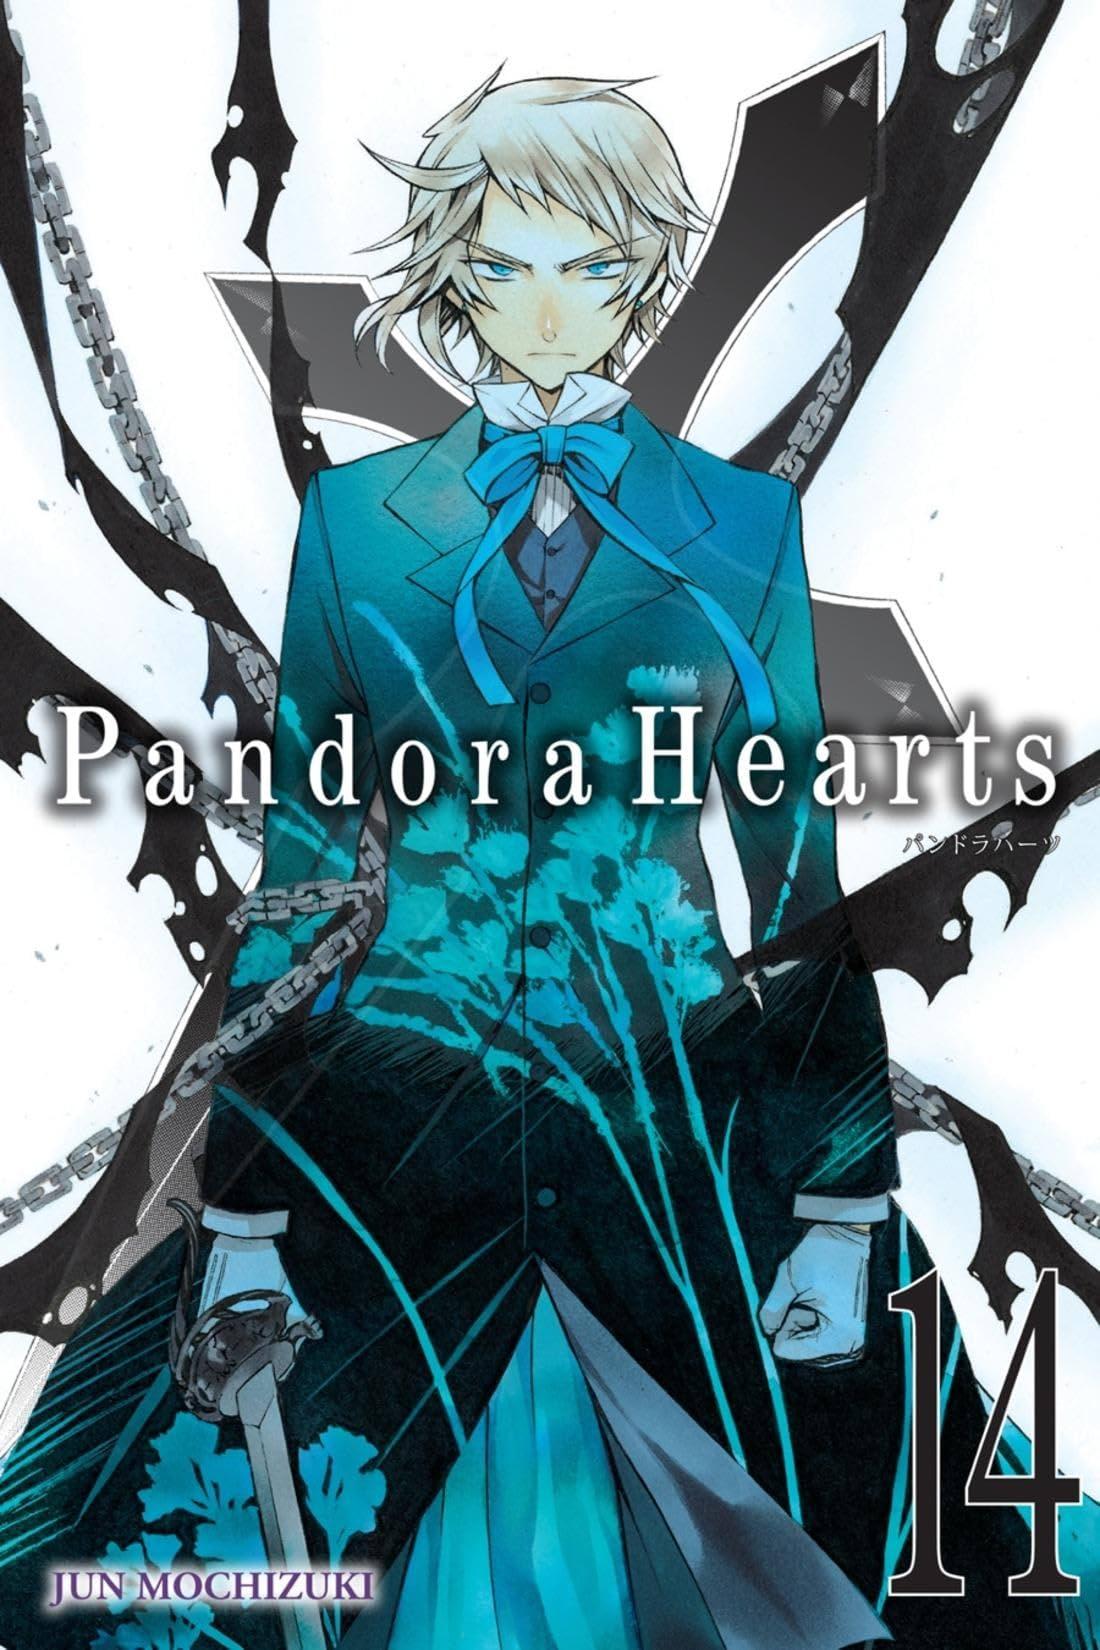 PandoraHearts Vol. 14